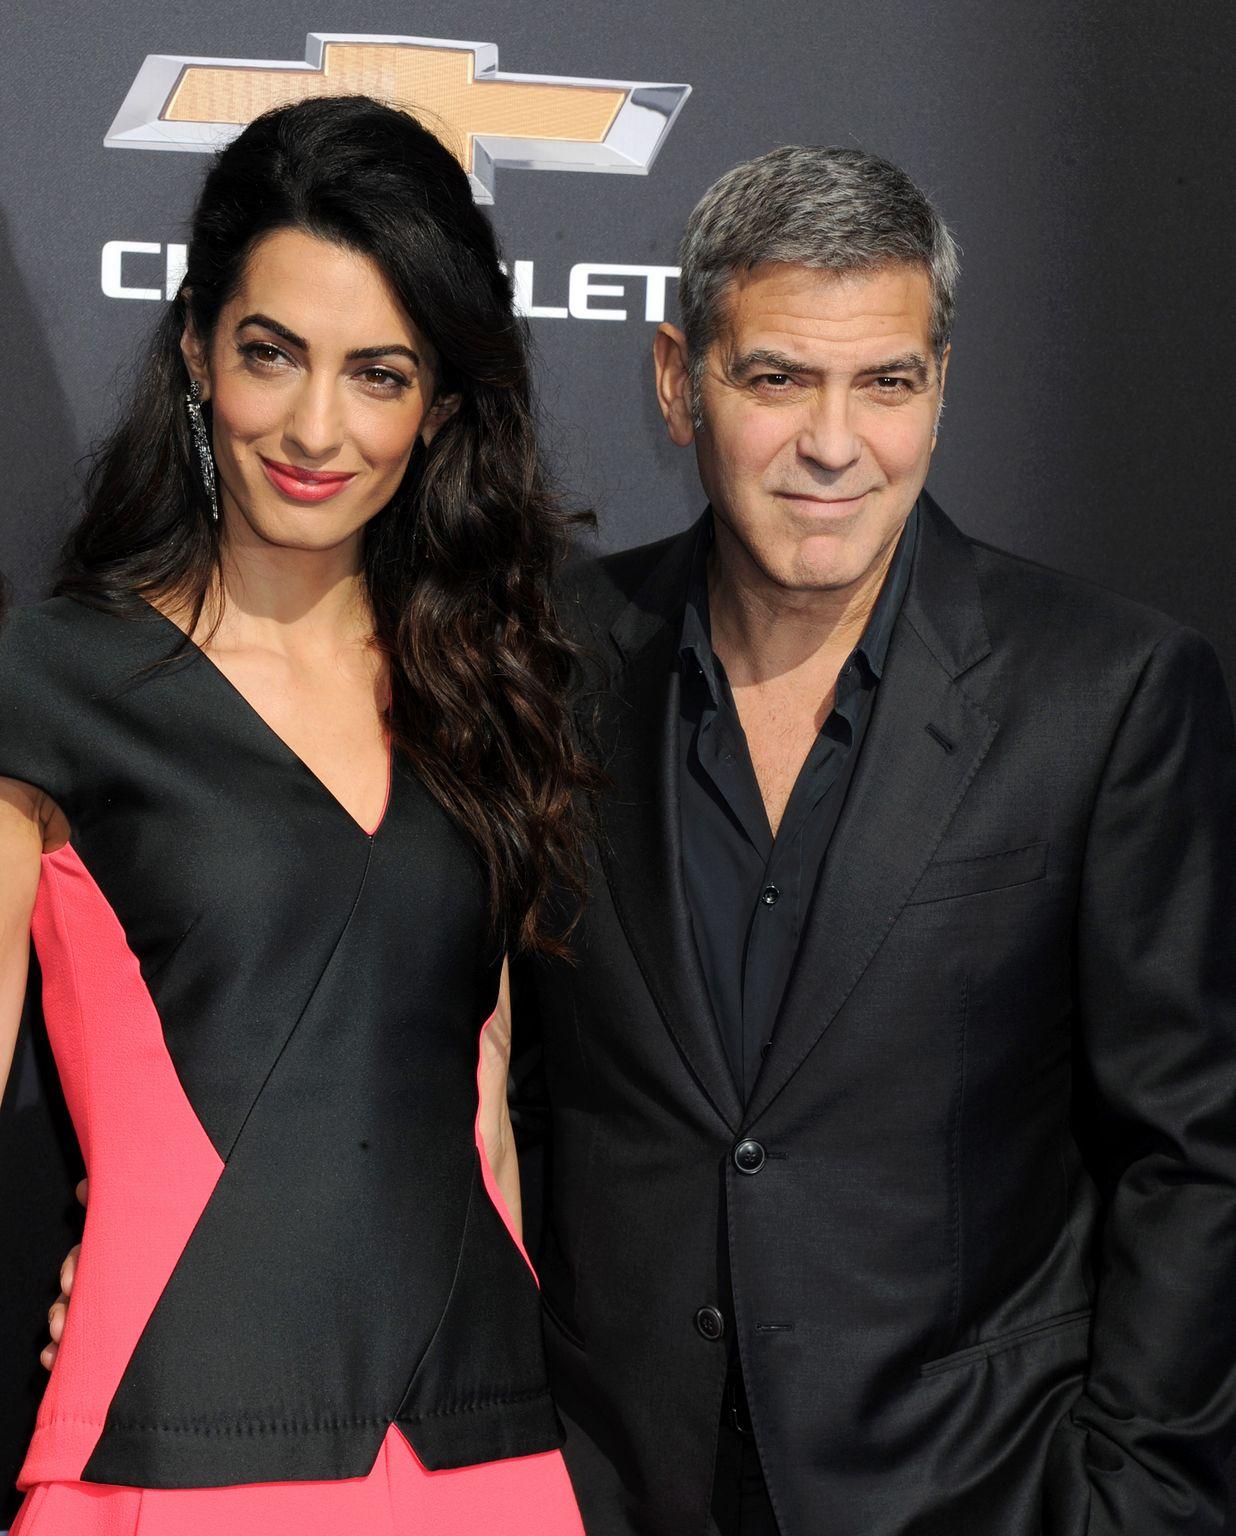 George Clooney and Amal Alamuddin at Tomorrowland Premiere-2